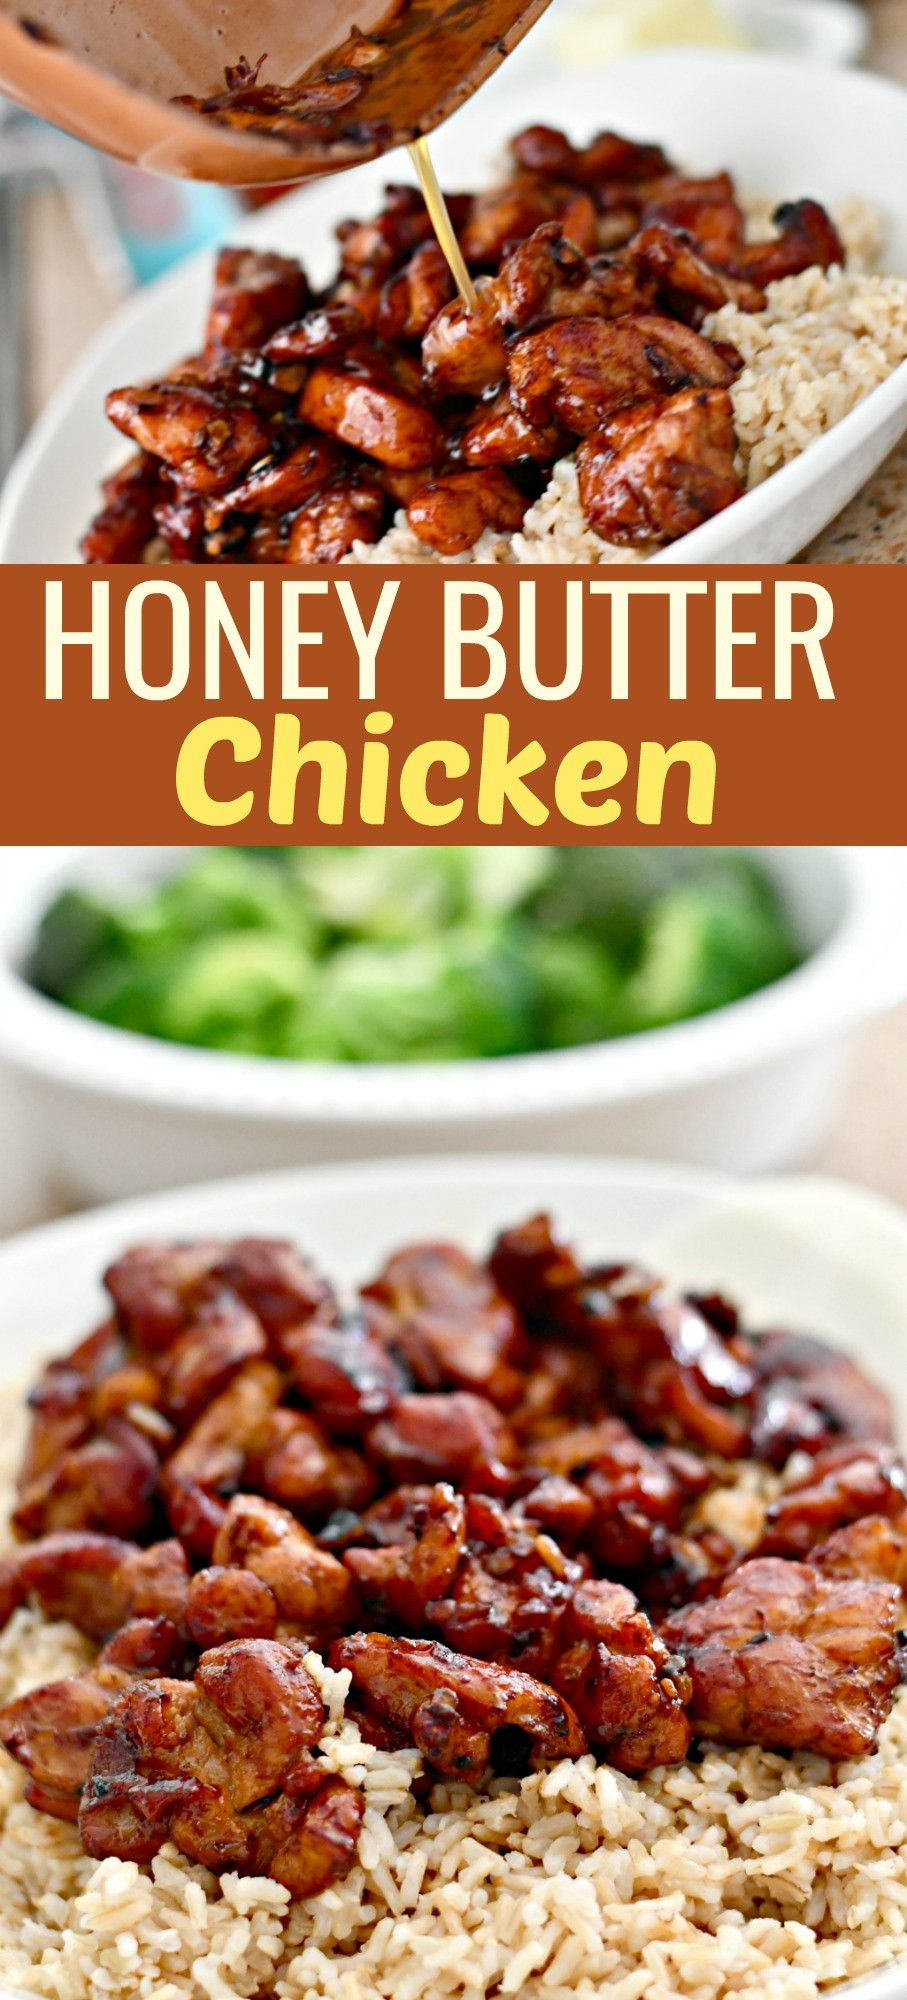 Honey Butter Chicken (Easy Skillet Meal) images